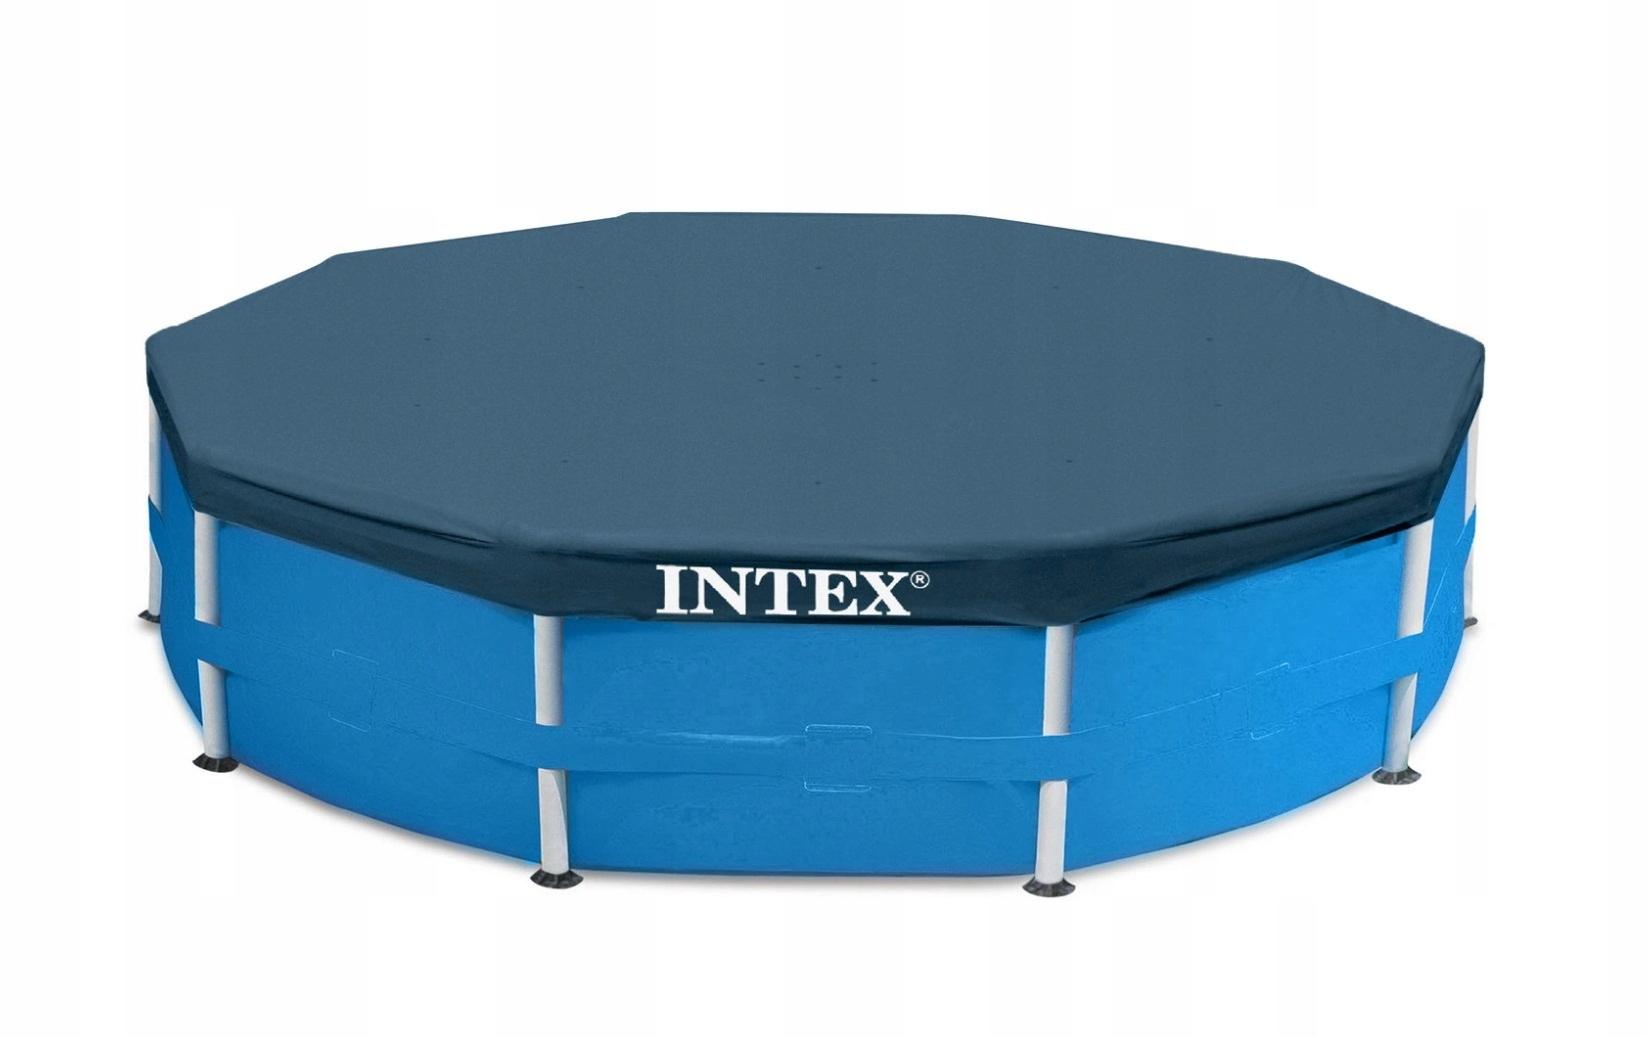 POKRYWA DO BASENU STELAŻOWEGO 366CM INTEX 28031 Producent INTEX